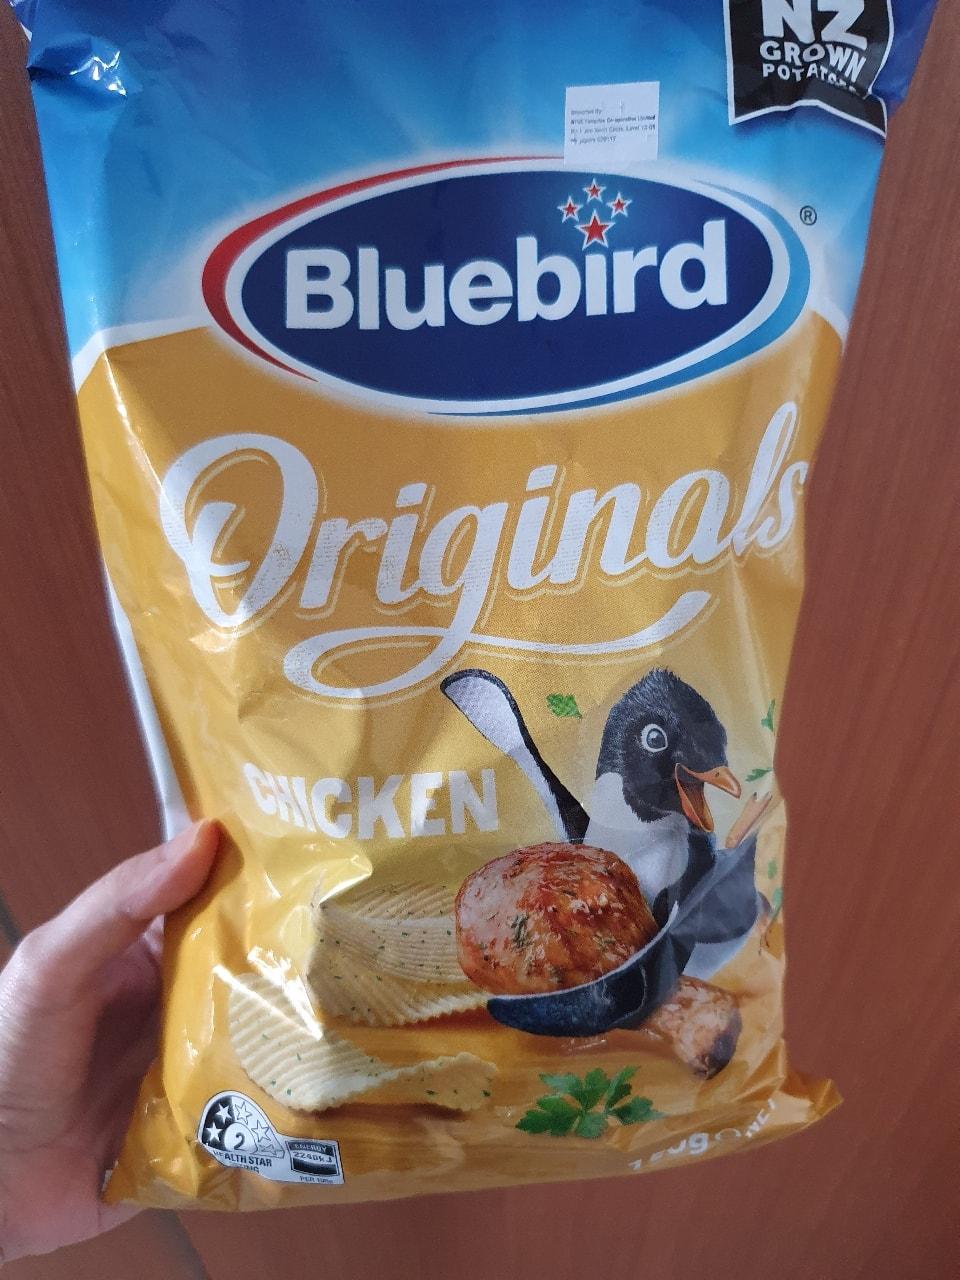 Bluebird chicken potato chips